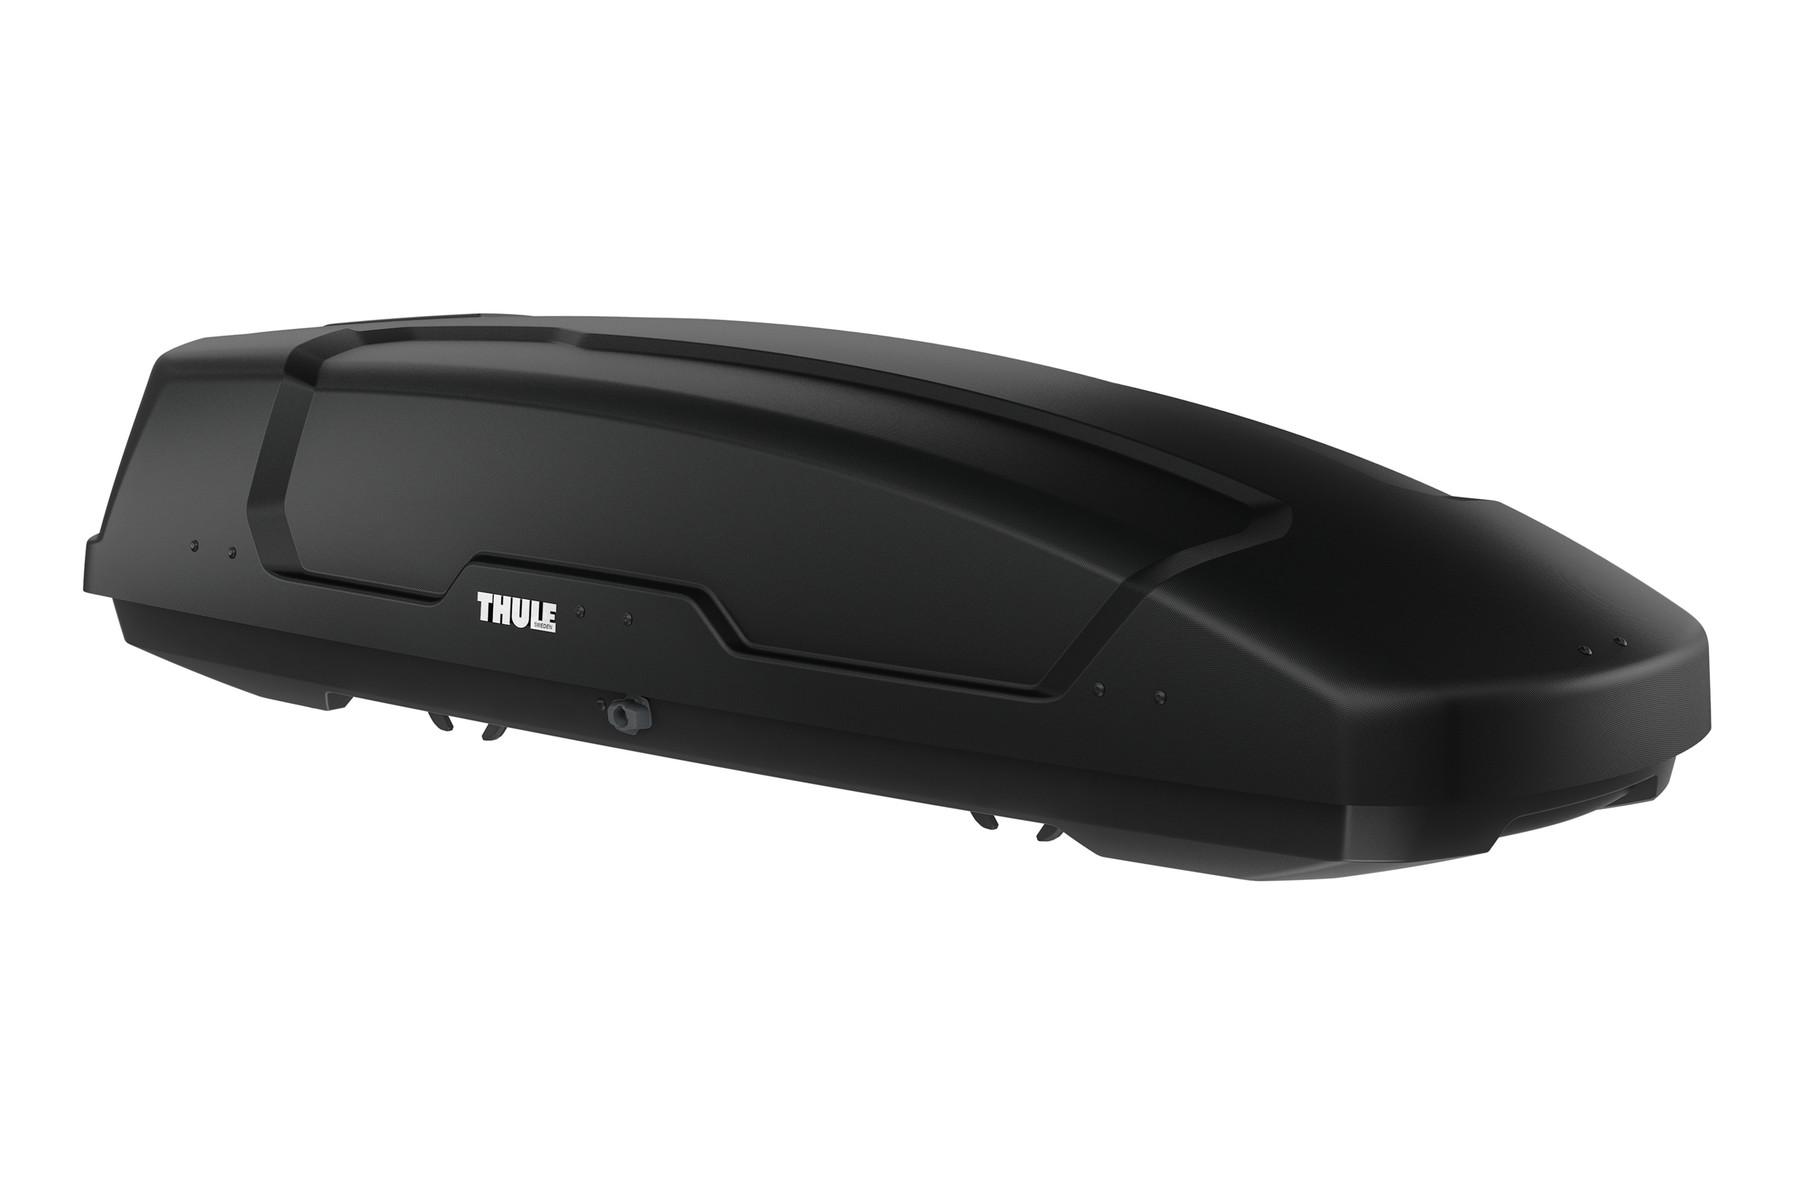 Thule Force XT Sport 300L Roof Box | Buy Online